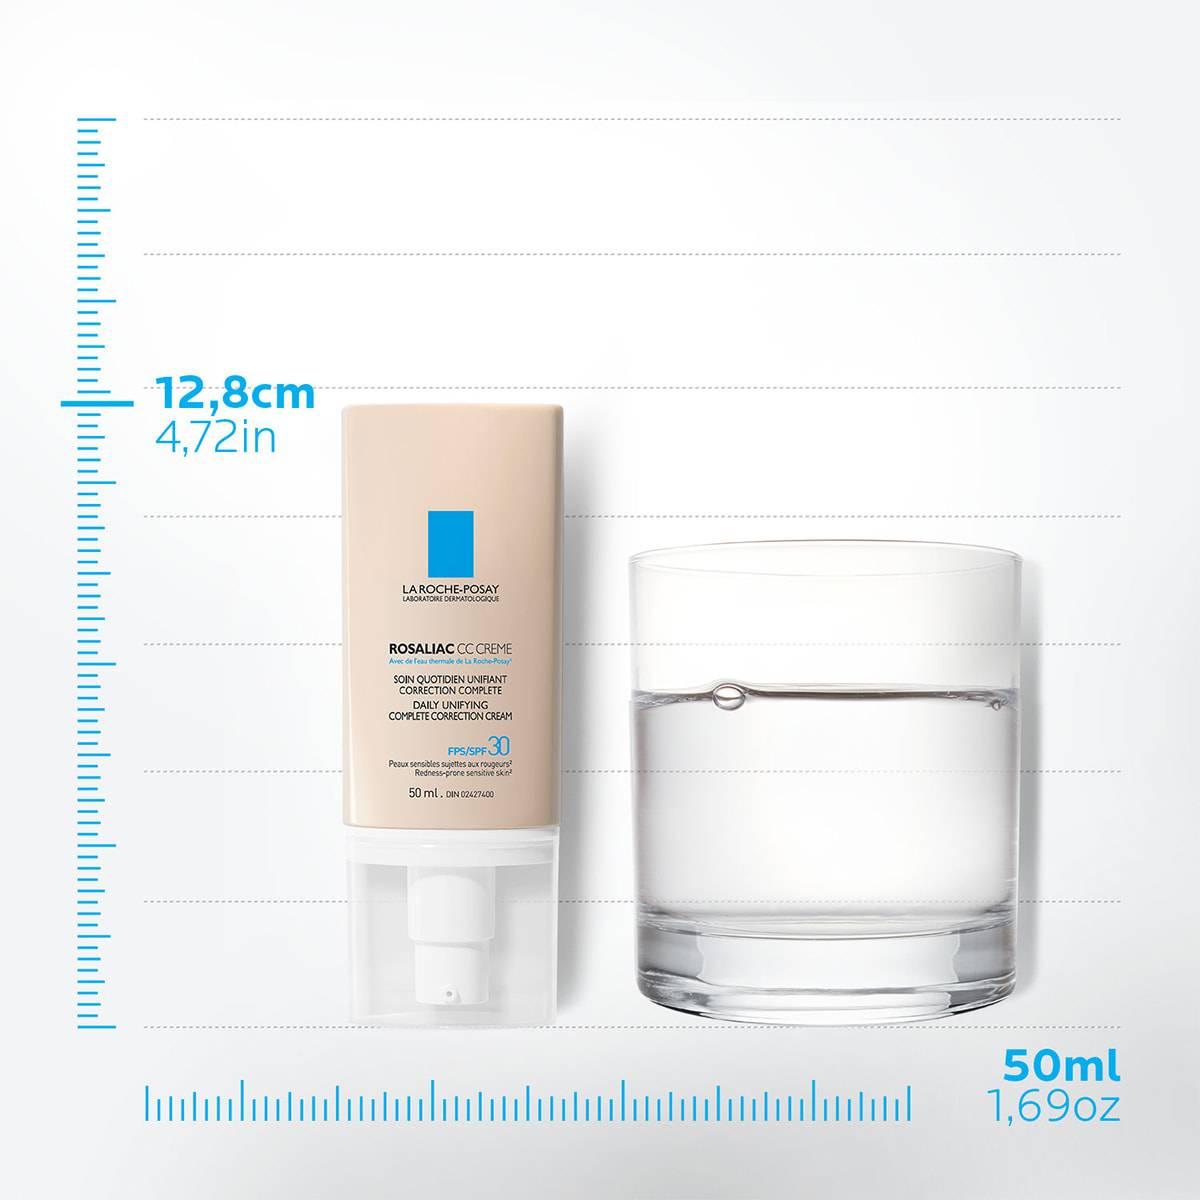 La Roche Posay ProduktSide Ansiktspleie Rosaliac CC Cream 50ml 3337872414